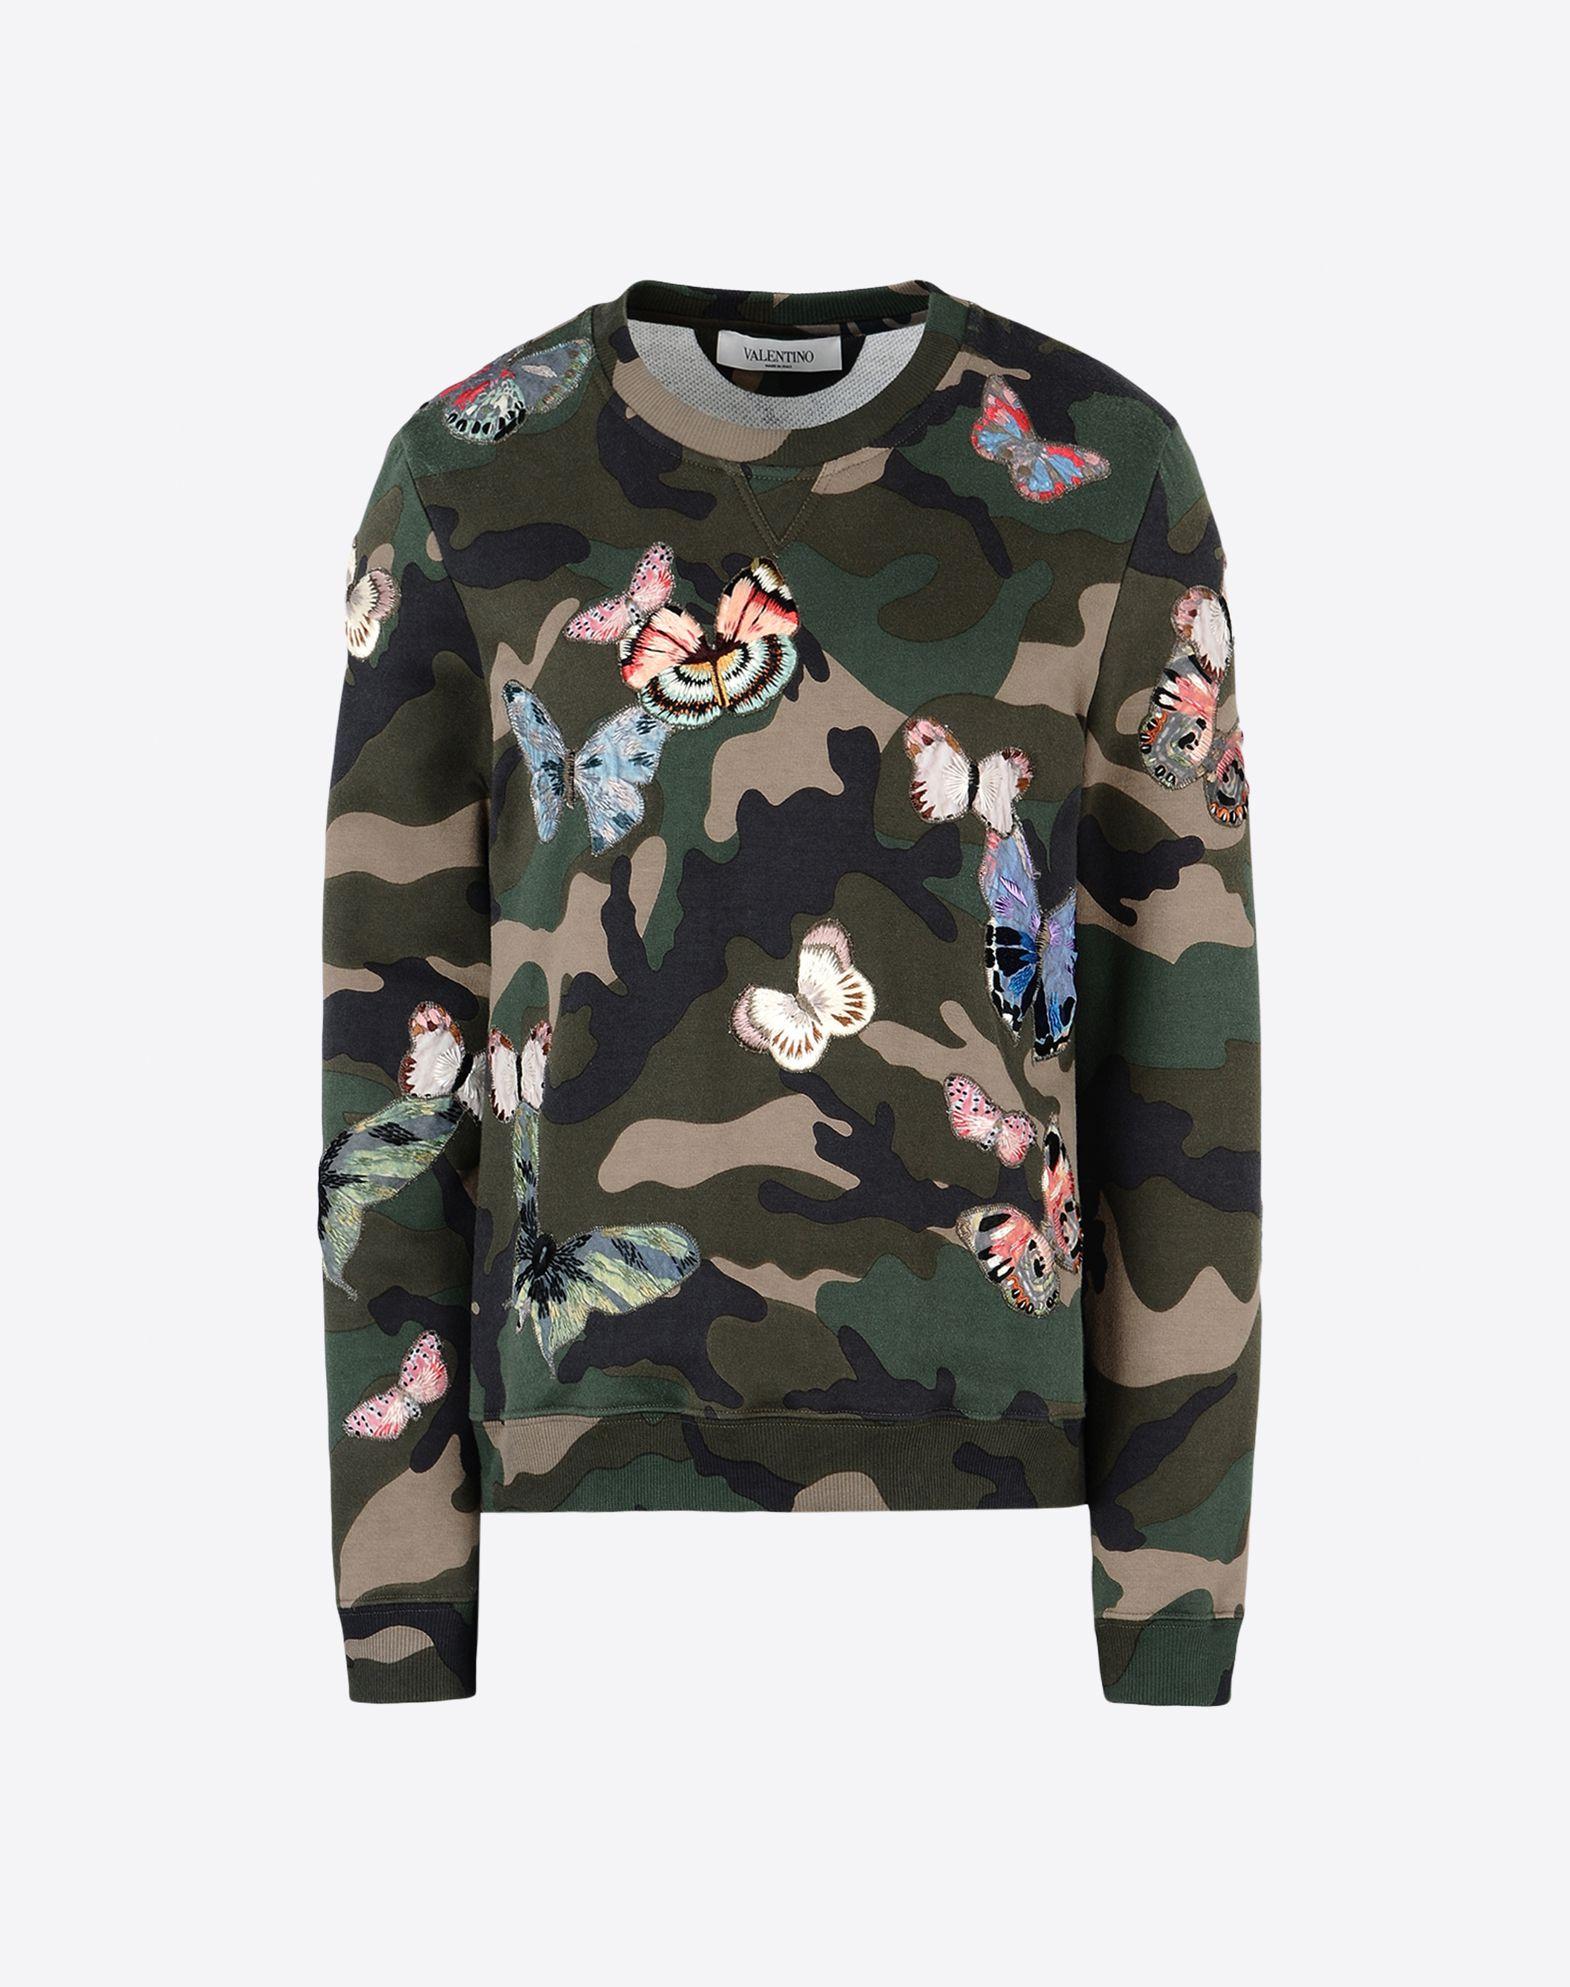 VALENTINO Embroidered detailing Sweatshirt fleece Camouflage design Round collar Long sleeves  37710367rw